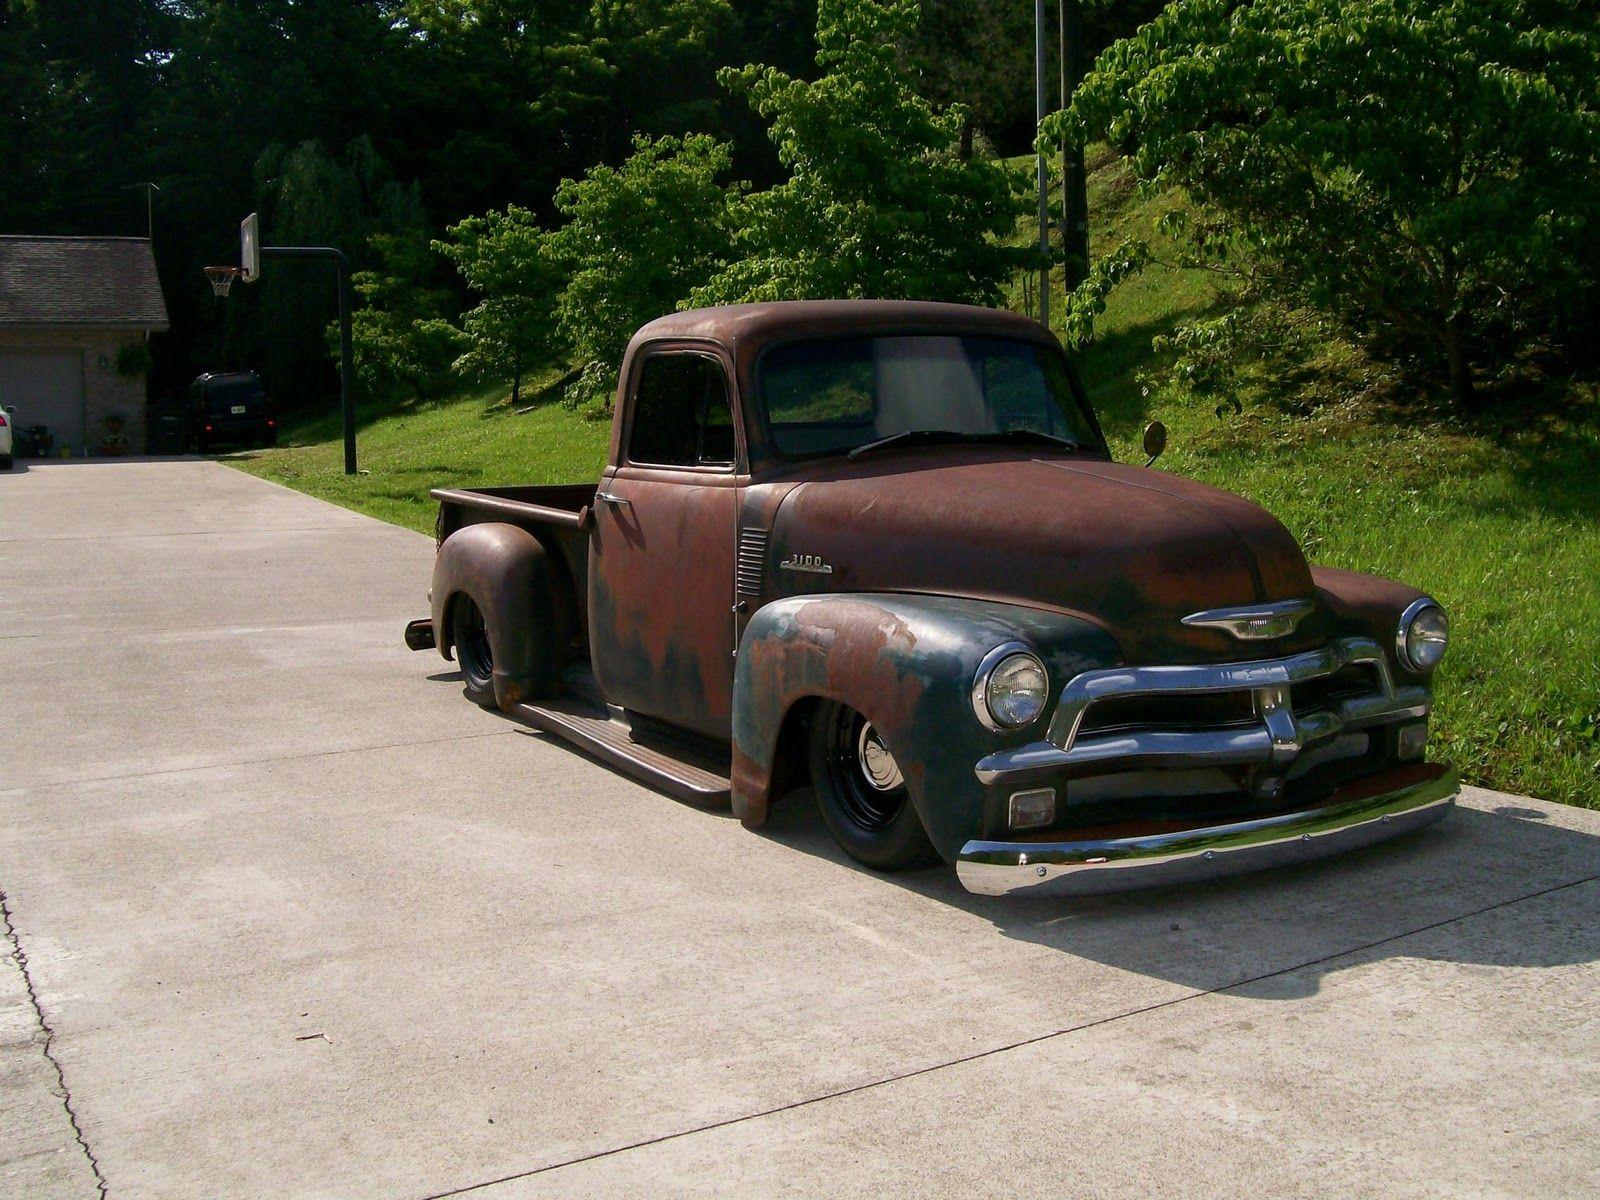 Rat Rods Hot Rod E Kustom Chevrolet Pick Up Boca De Sapo1954 Estilo Rat Rod Caminhao Chevrolet Caminhoes Vintage Rat Rods